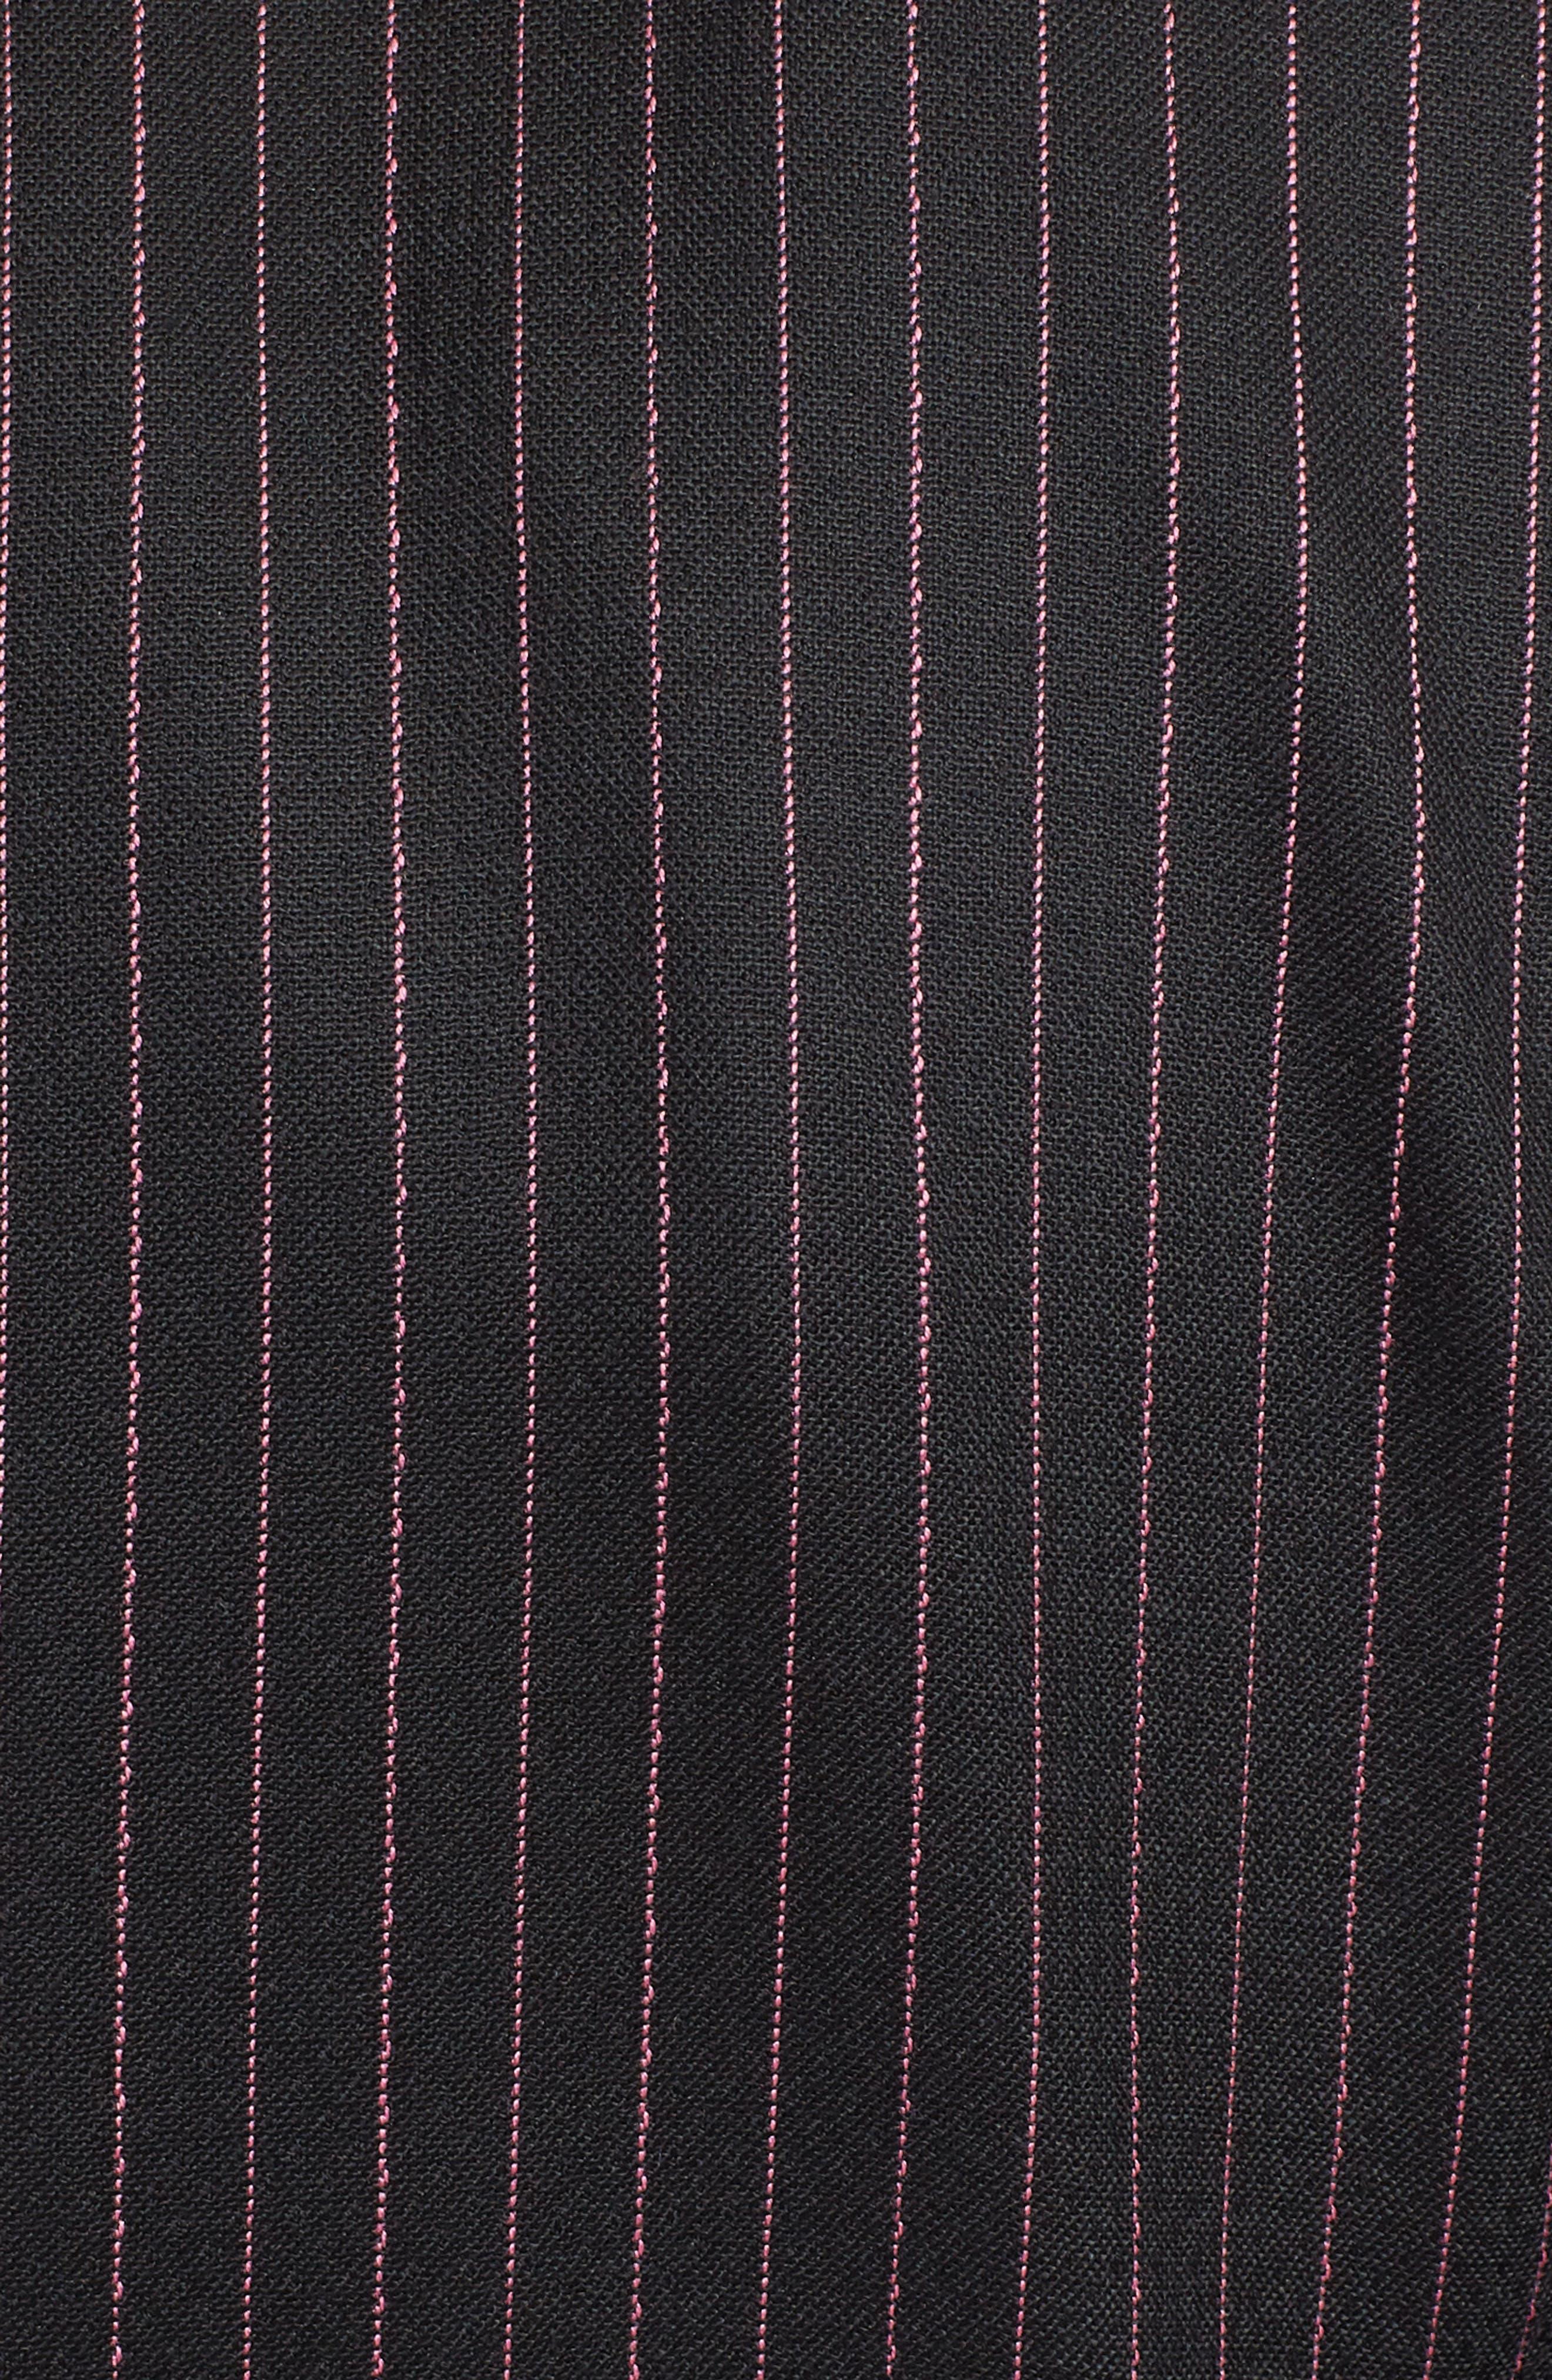 Pinstripe Stretch Wool Jacket,                             Alternate thumbnail 5, color,                             BLACK